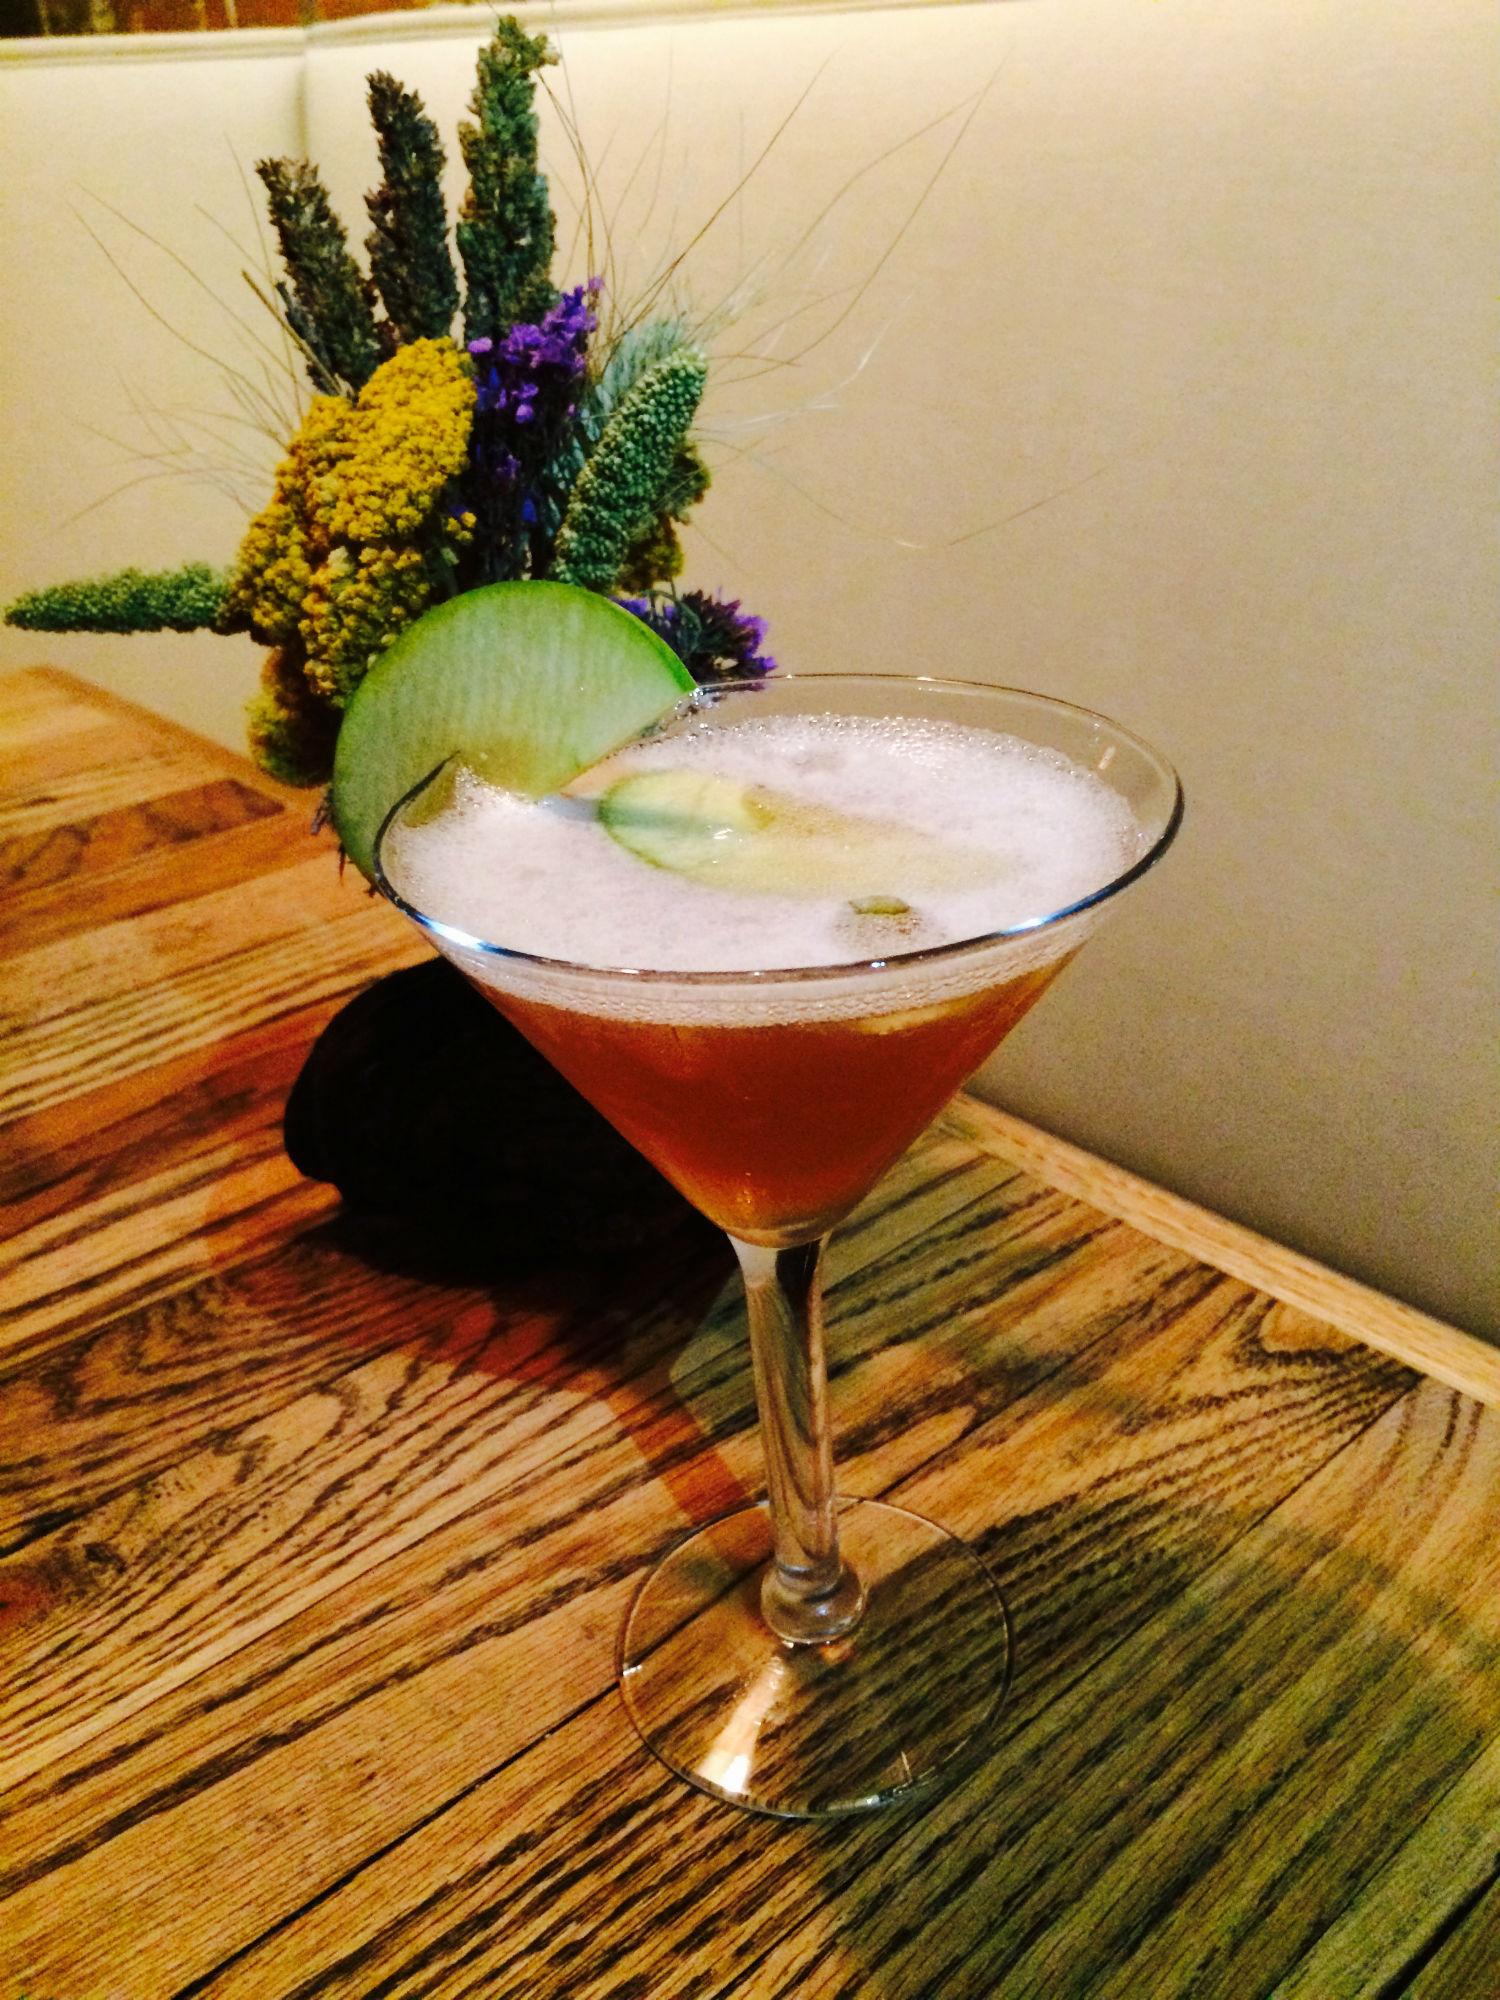 Granny Smith Apple Infused Martini